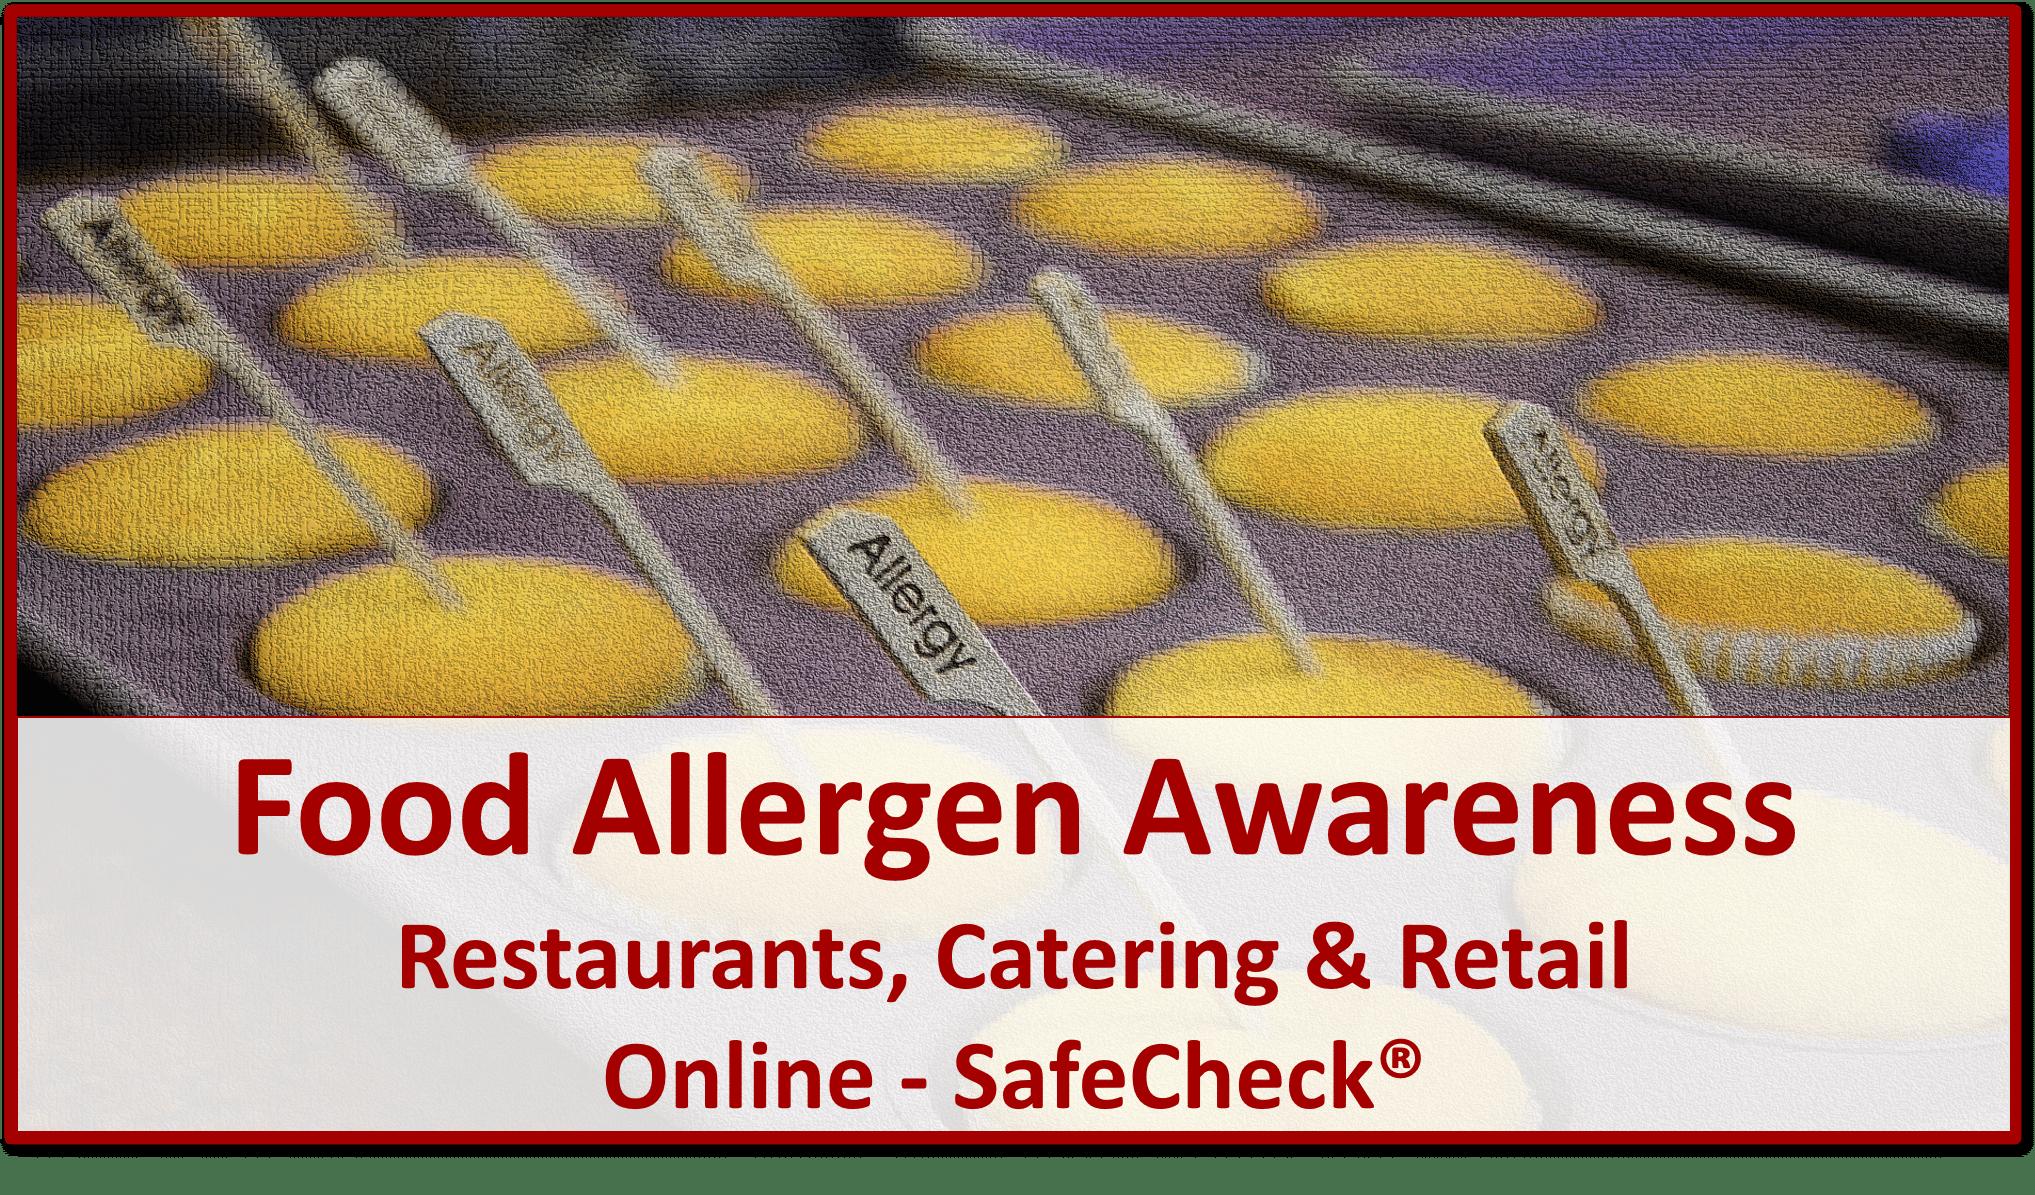 Food Allergen Awareness for Foodservice